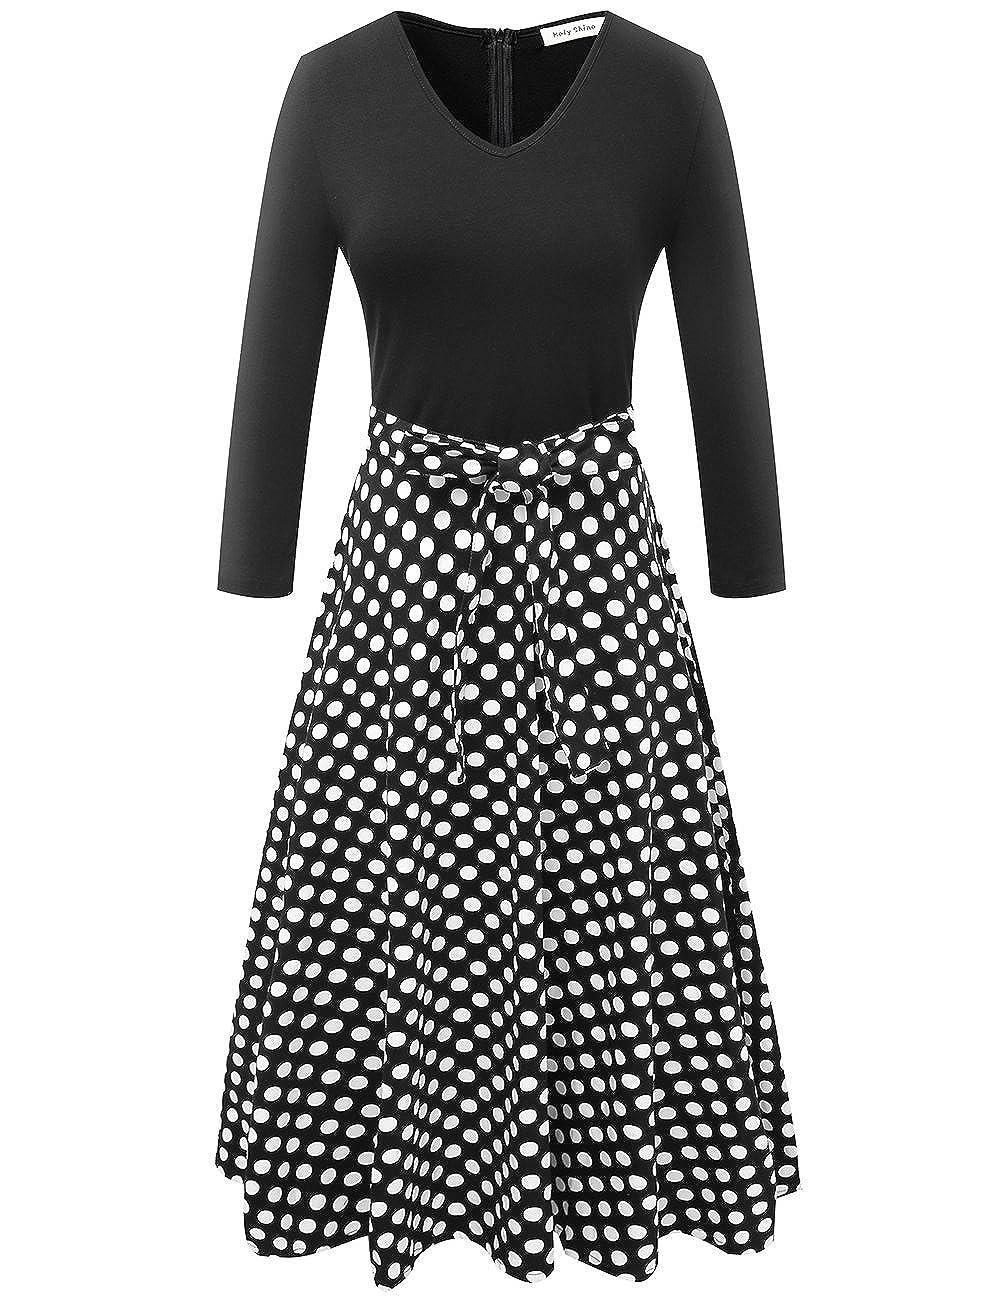 f8b62c87da33c Top:95%cotton + 5%spandex,Skirt:97%cotton + 5%spandex. Machine Washable/  Hand wash cold/Don\'t bleach/ Air Dry,low iron if needed. Polka dot a line  dress: ...